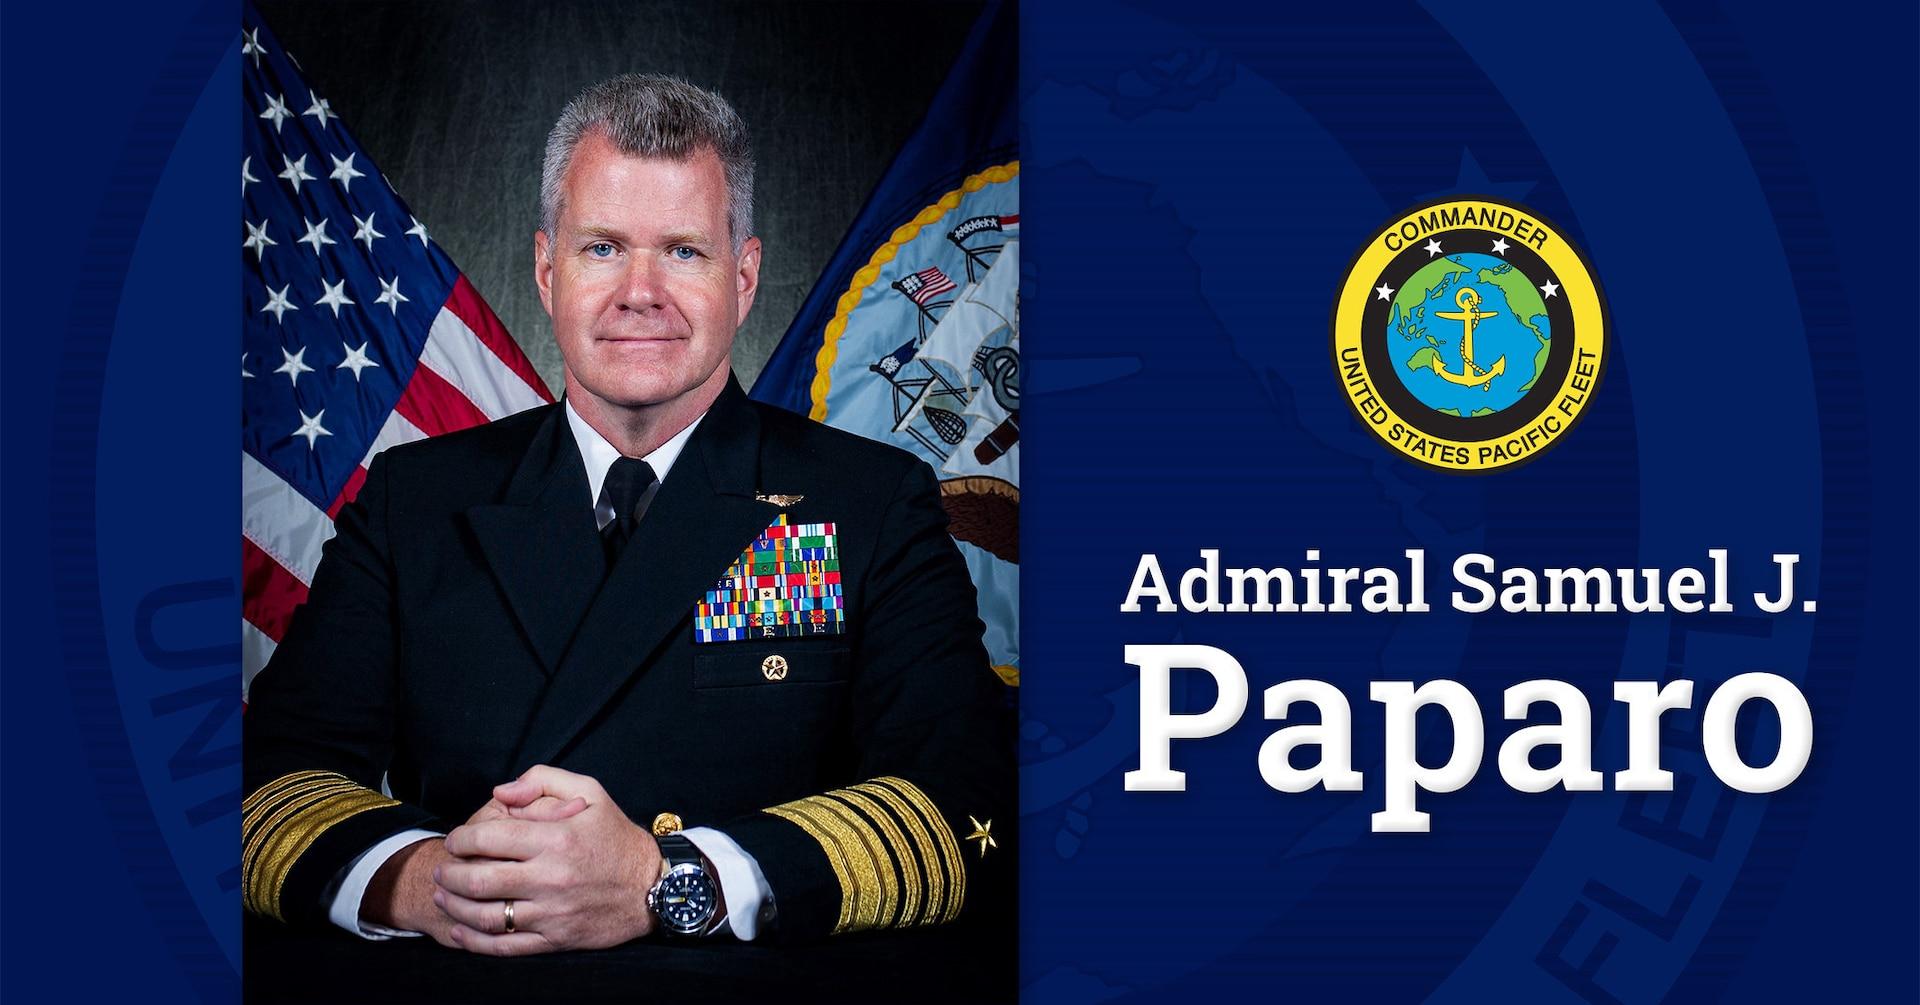 Paparo takes helm as U.S. Pacific Fleet commander